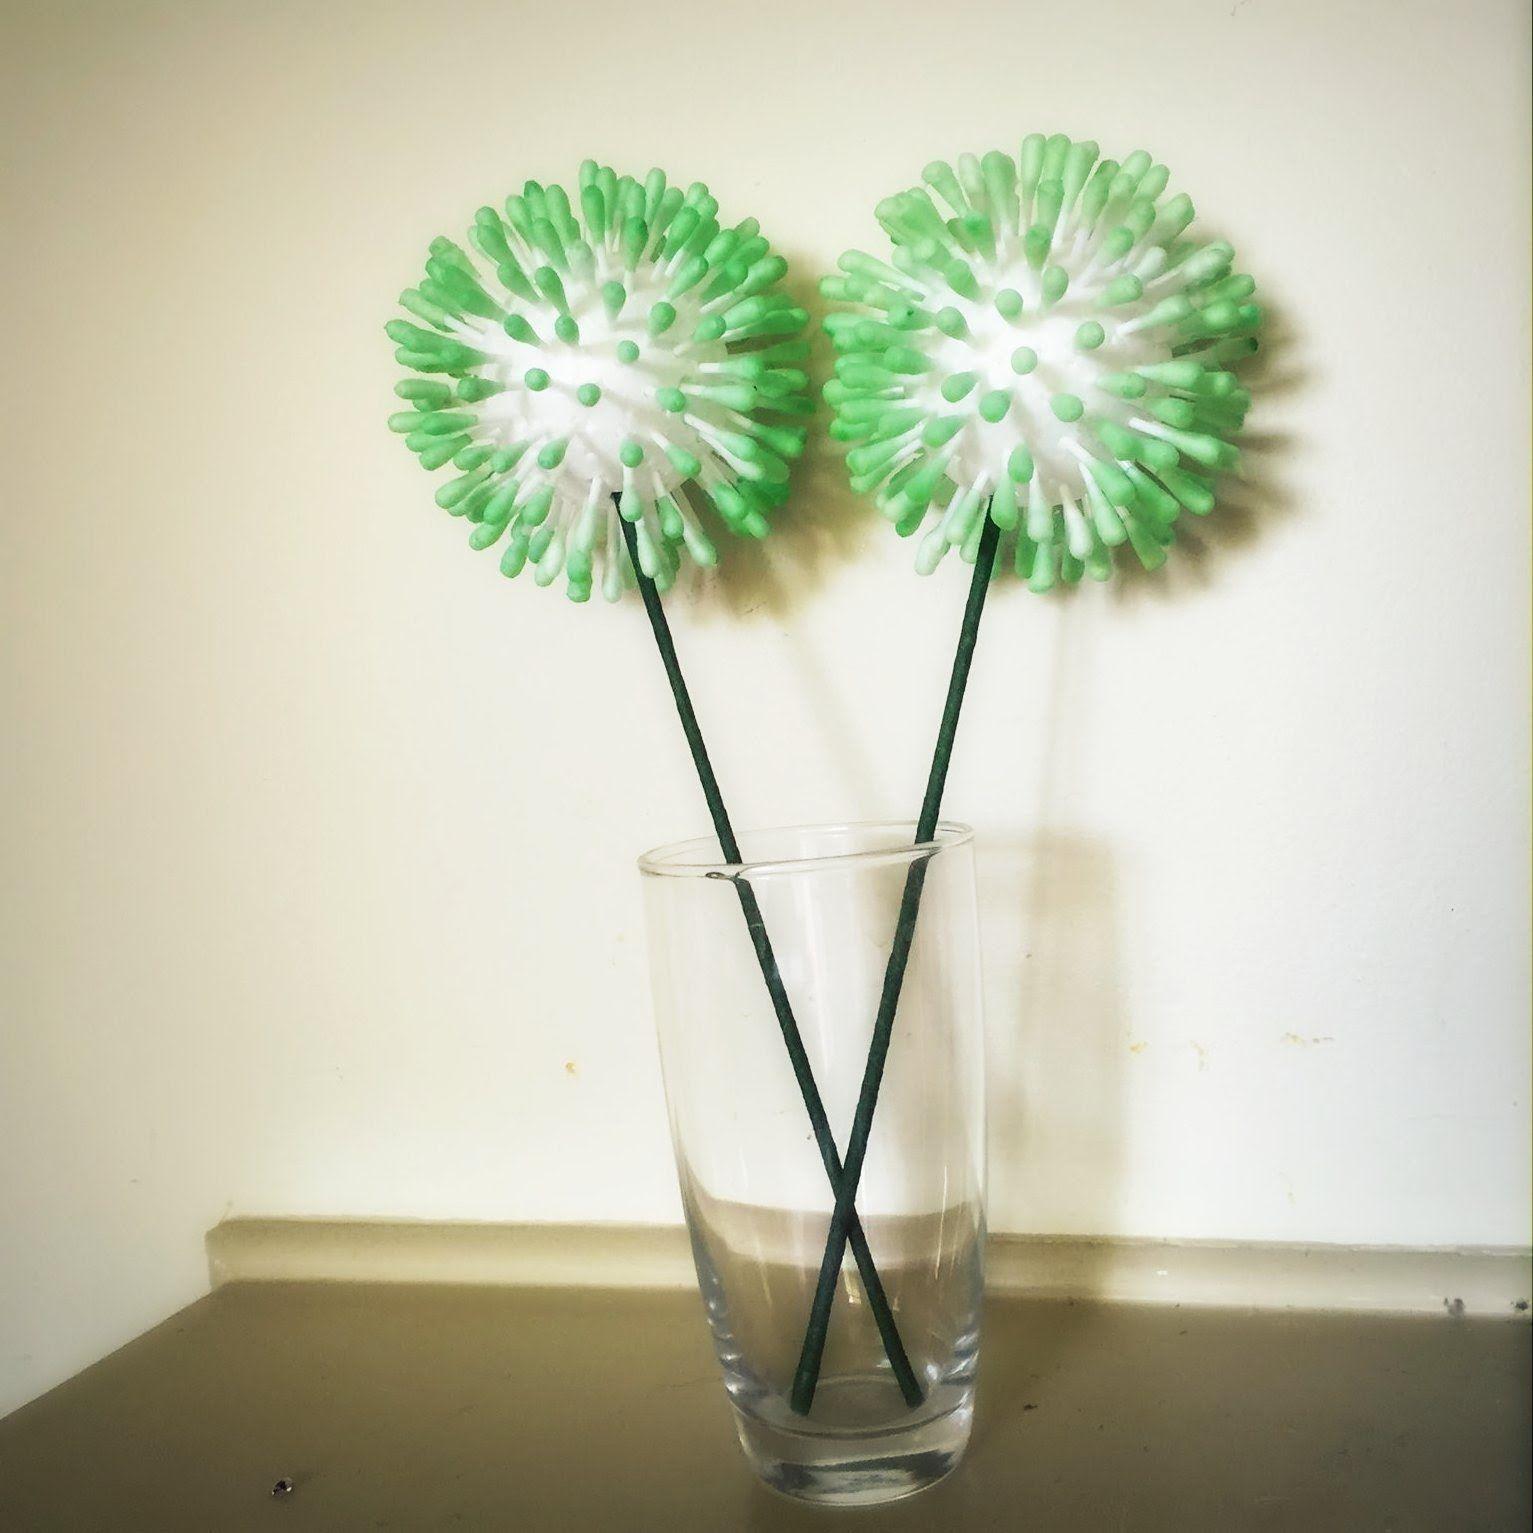 DIY Home decor:Easy q-tip /cotton bud /Cotton swabs flower/ school craft  project